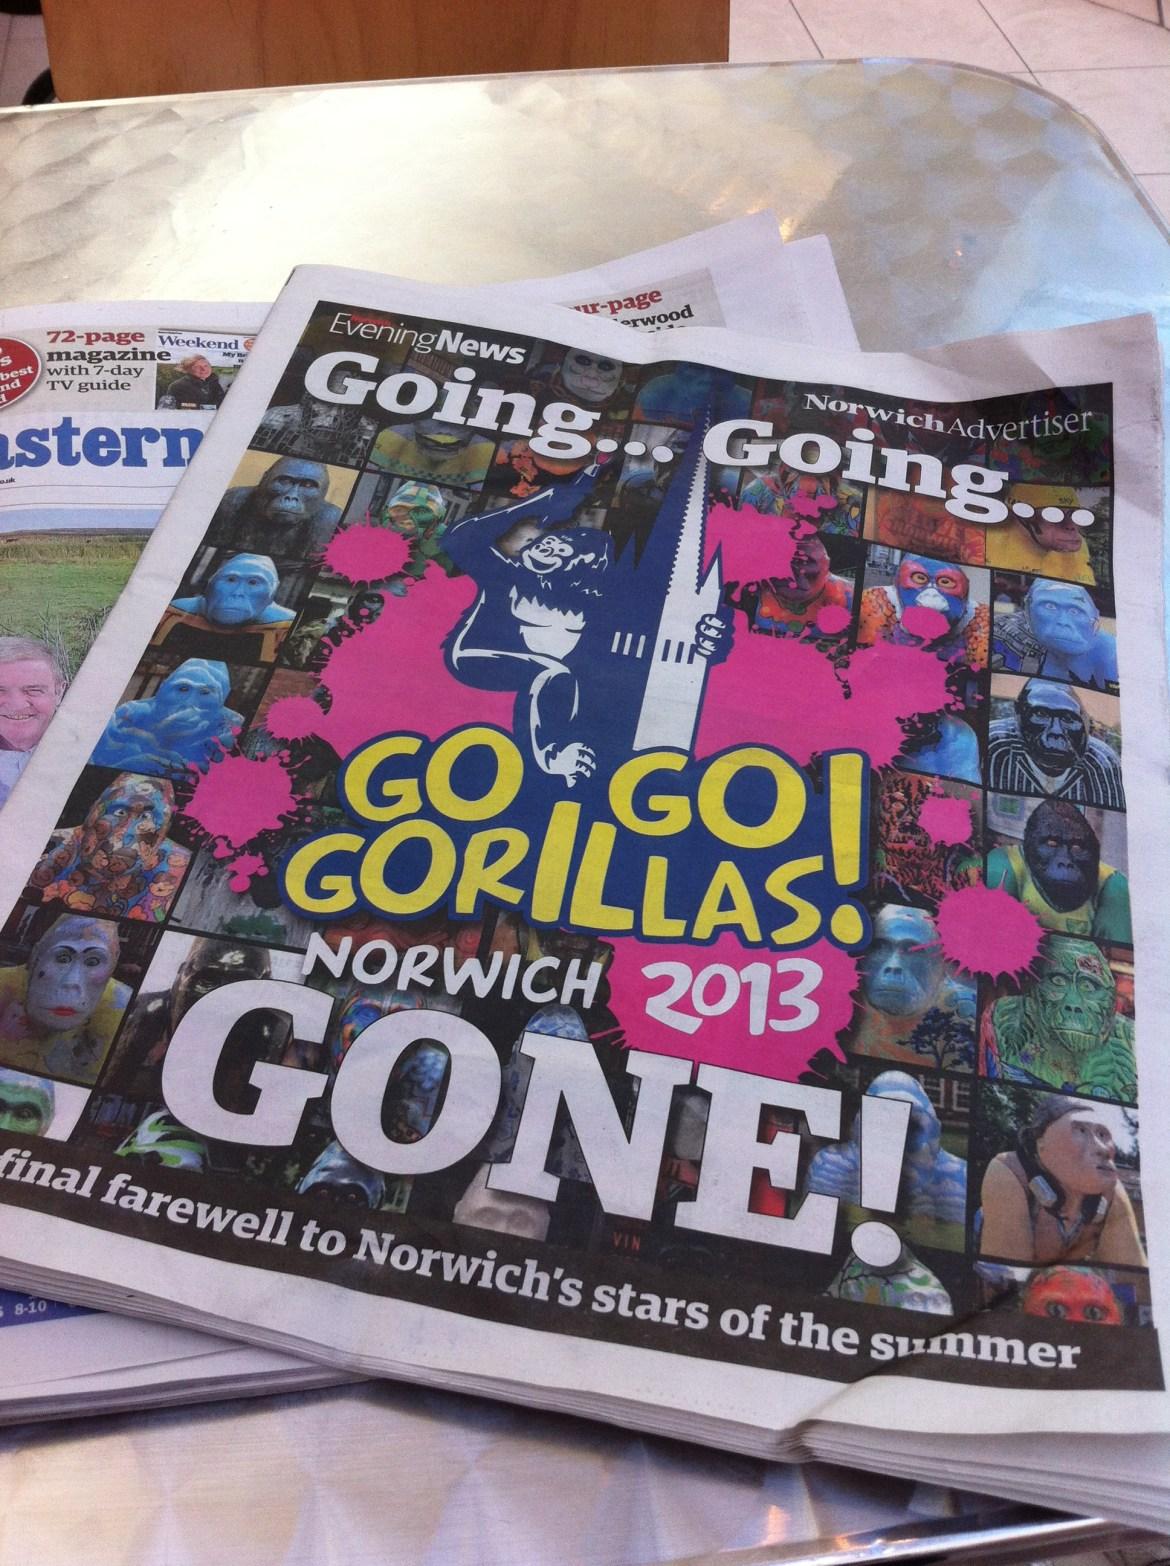 Go Go Gorillas 2013 - Norwich